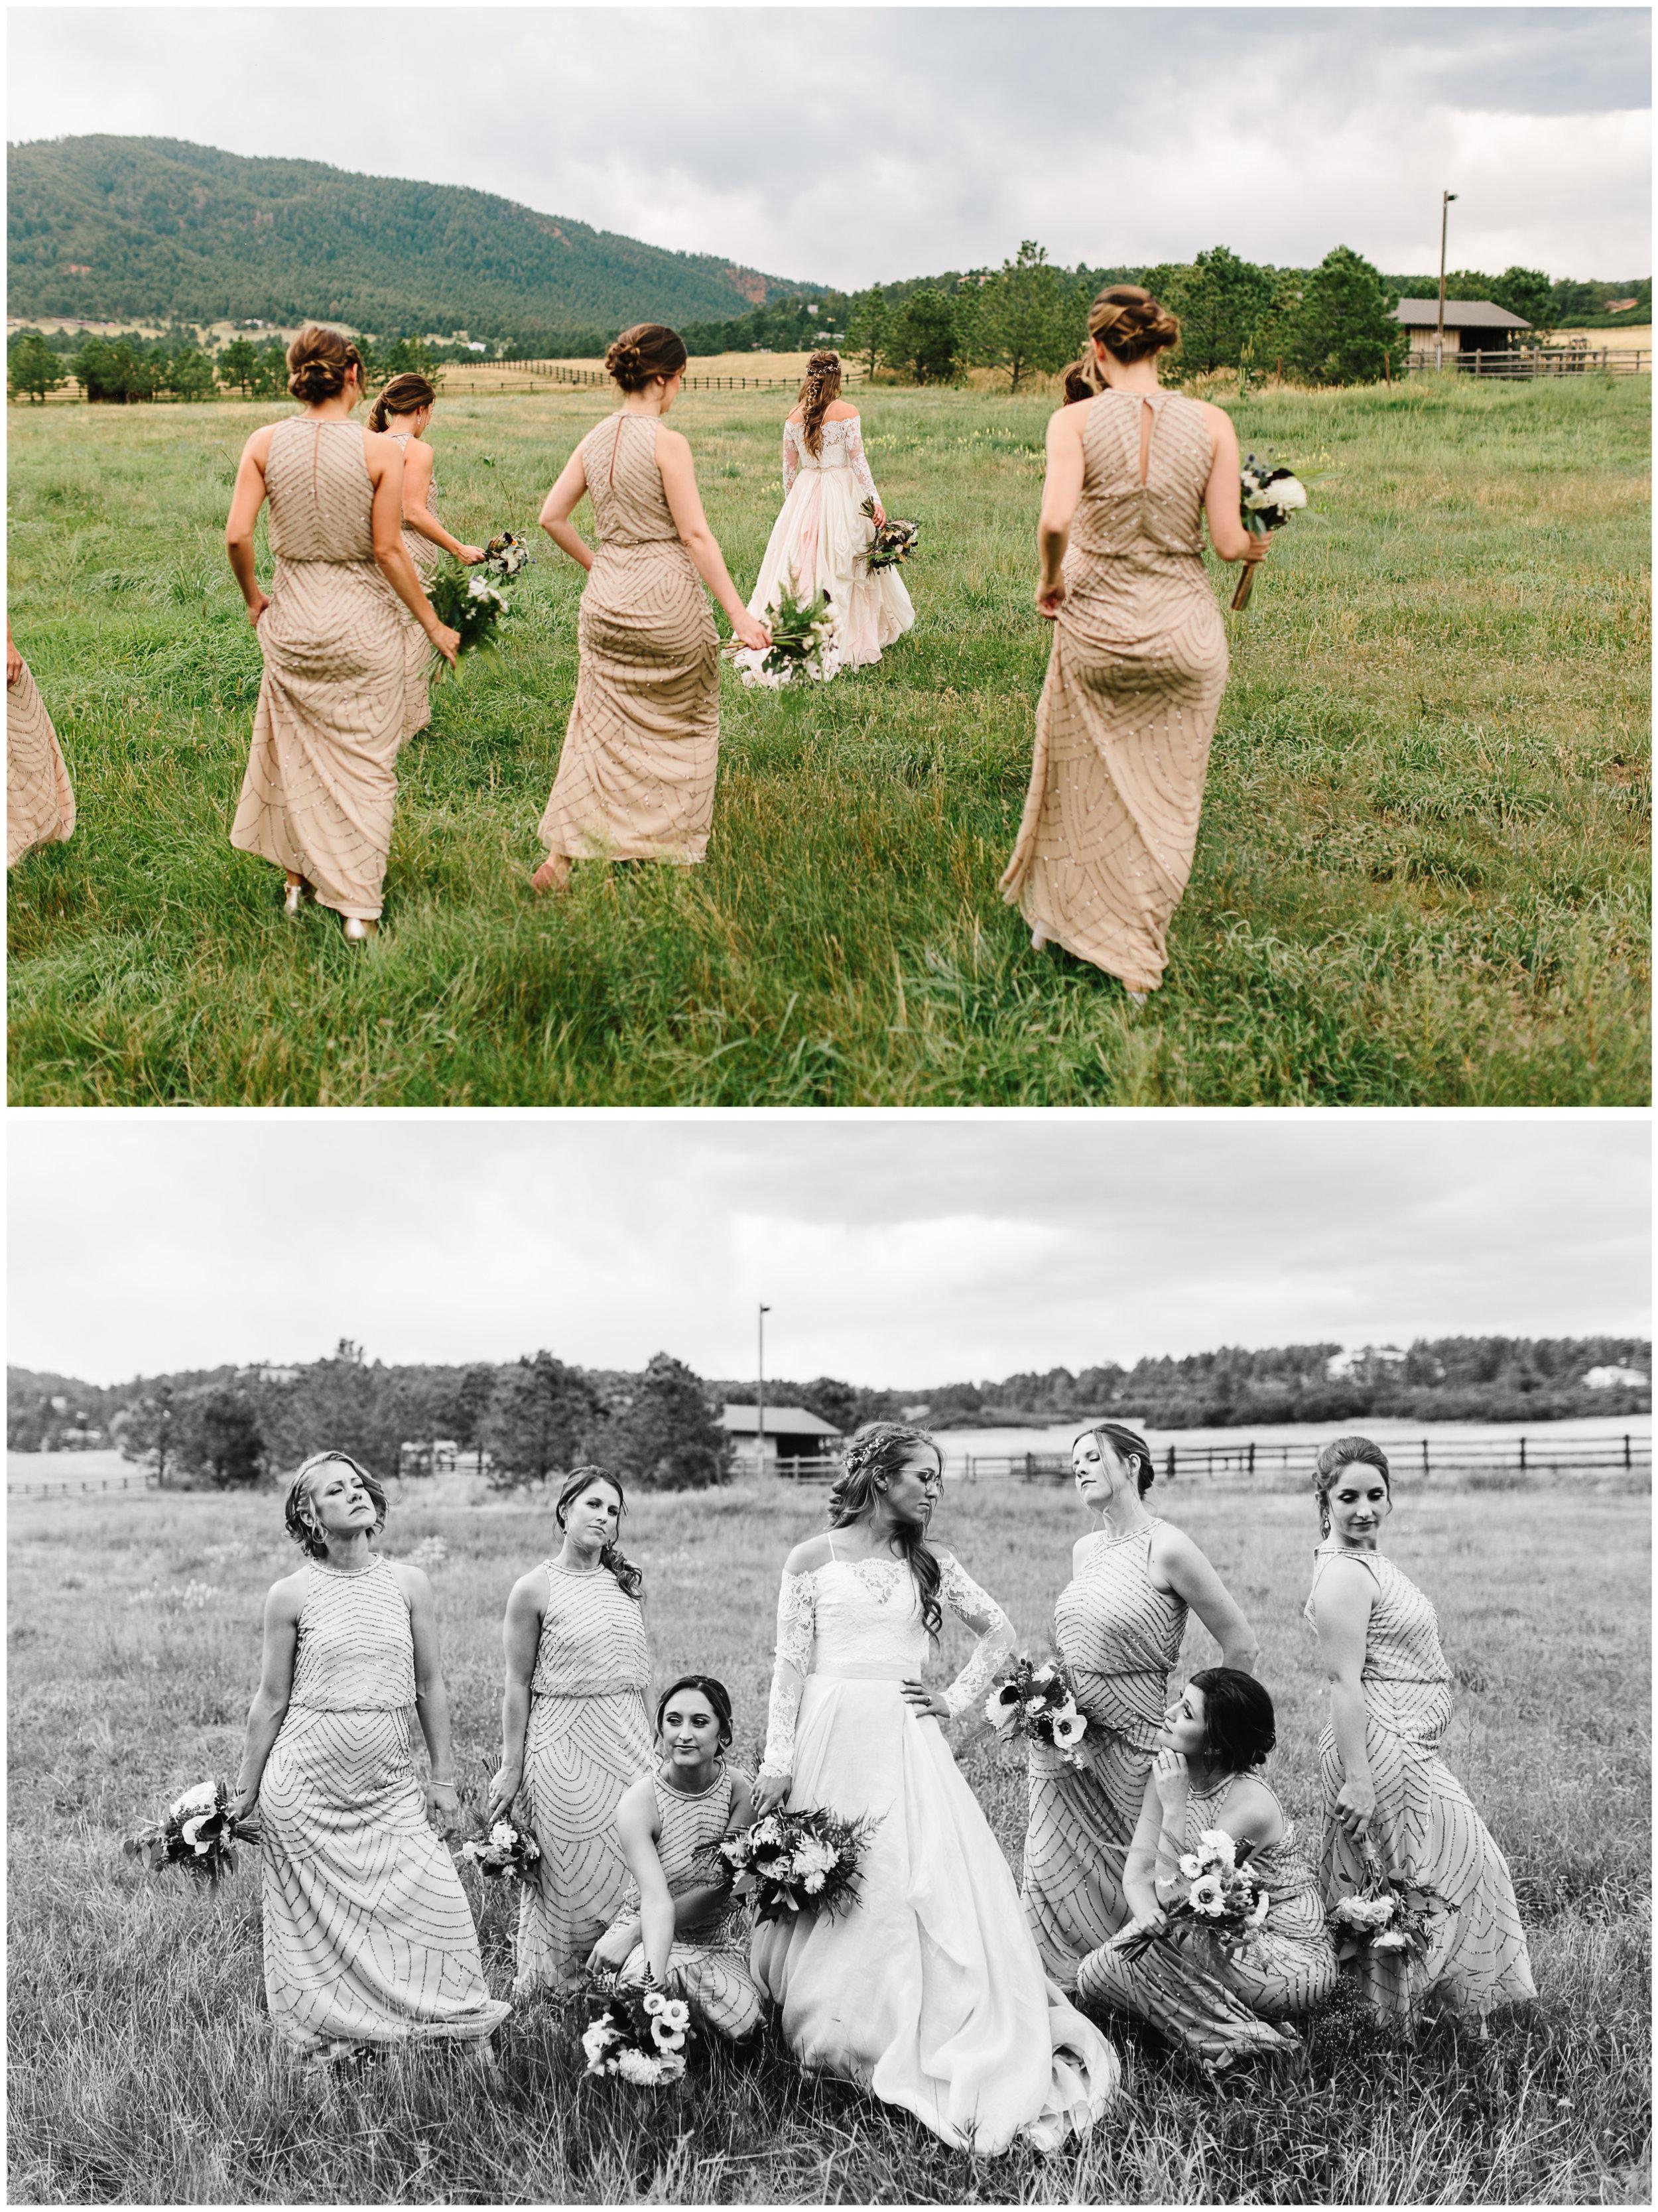 spruce_mountain_ranch_wedding_44.jpg